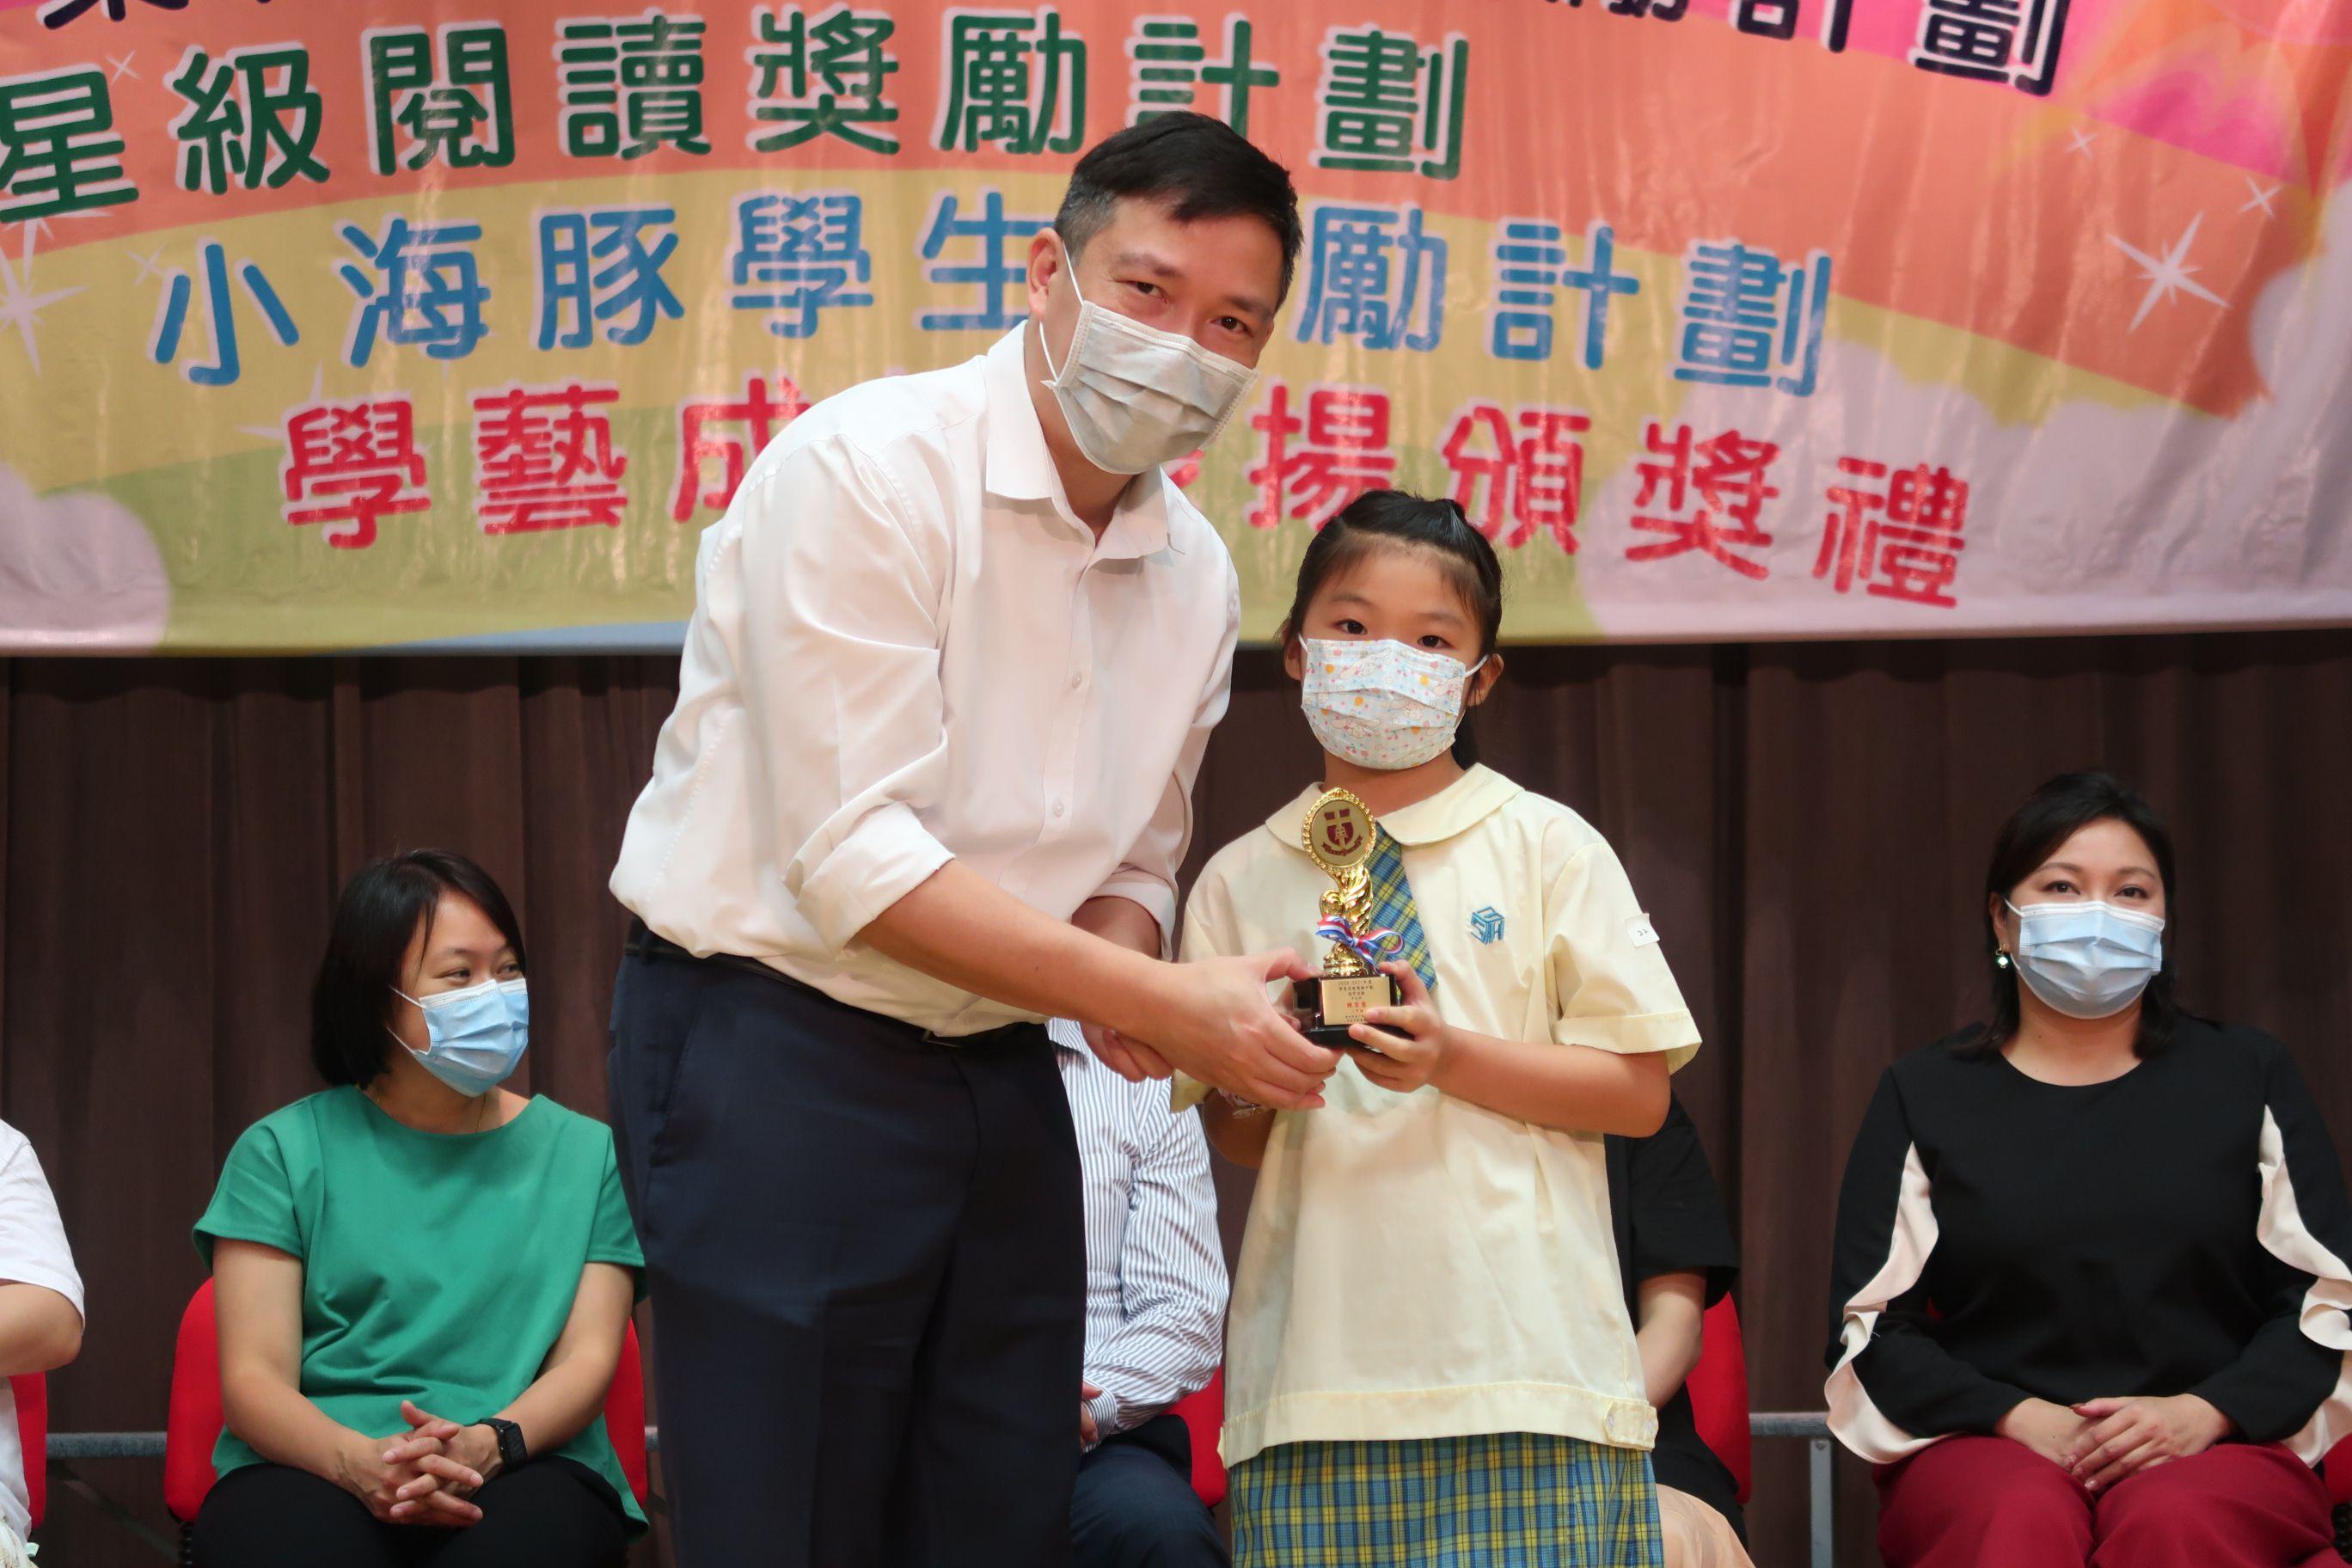 https://syh.edu.hk/sites/default/files/img_5642.jpg